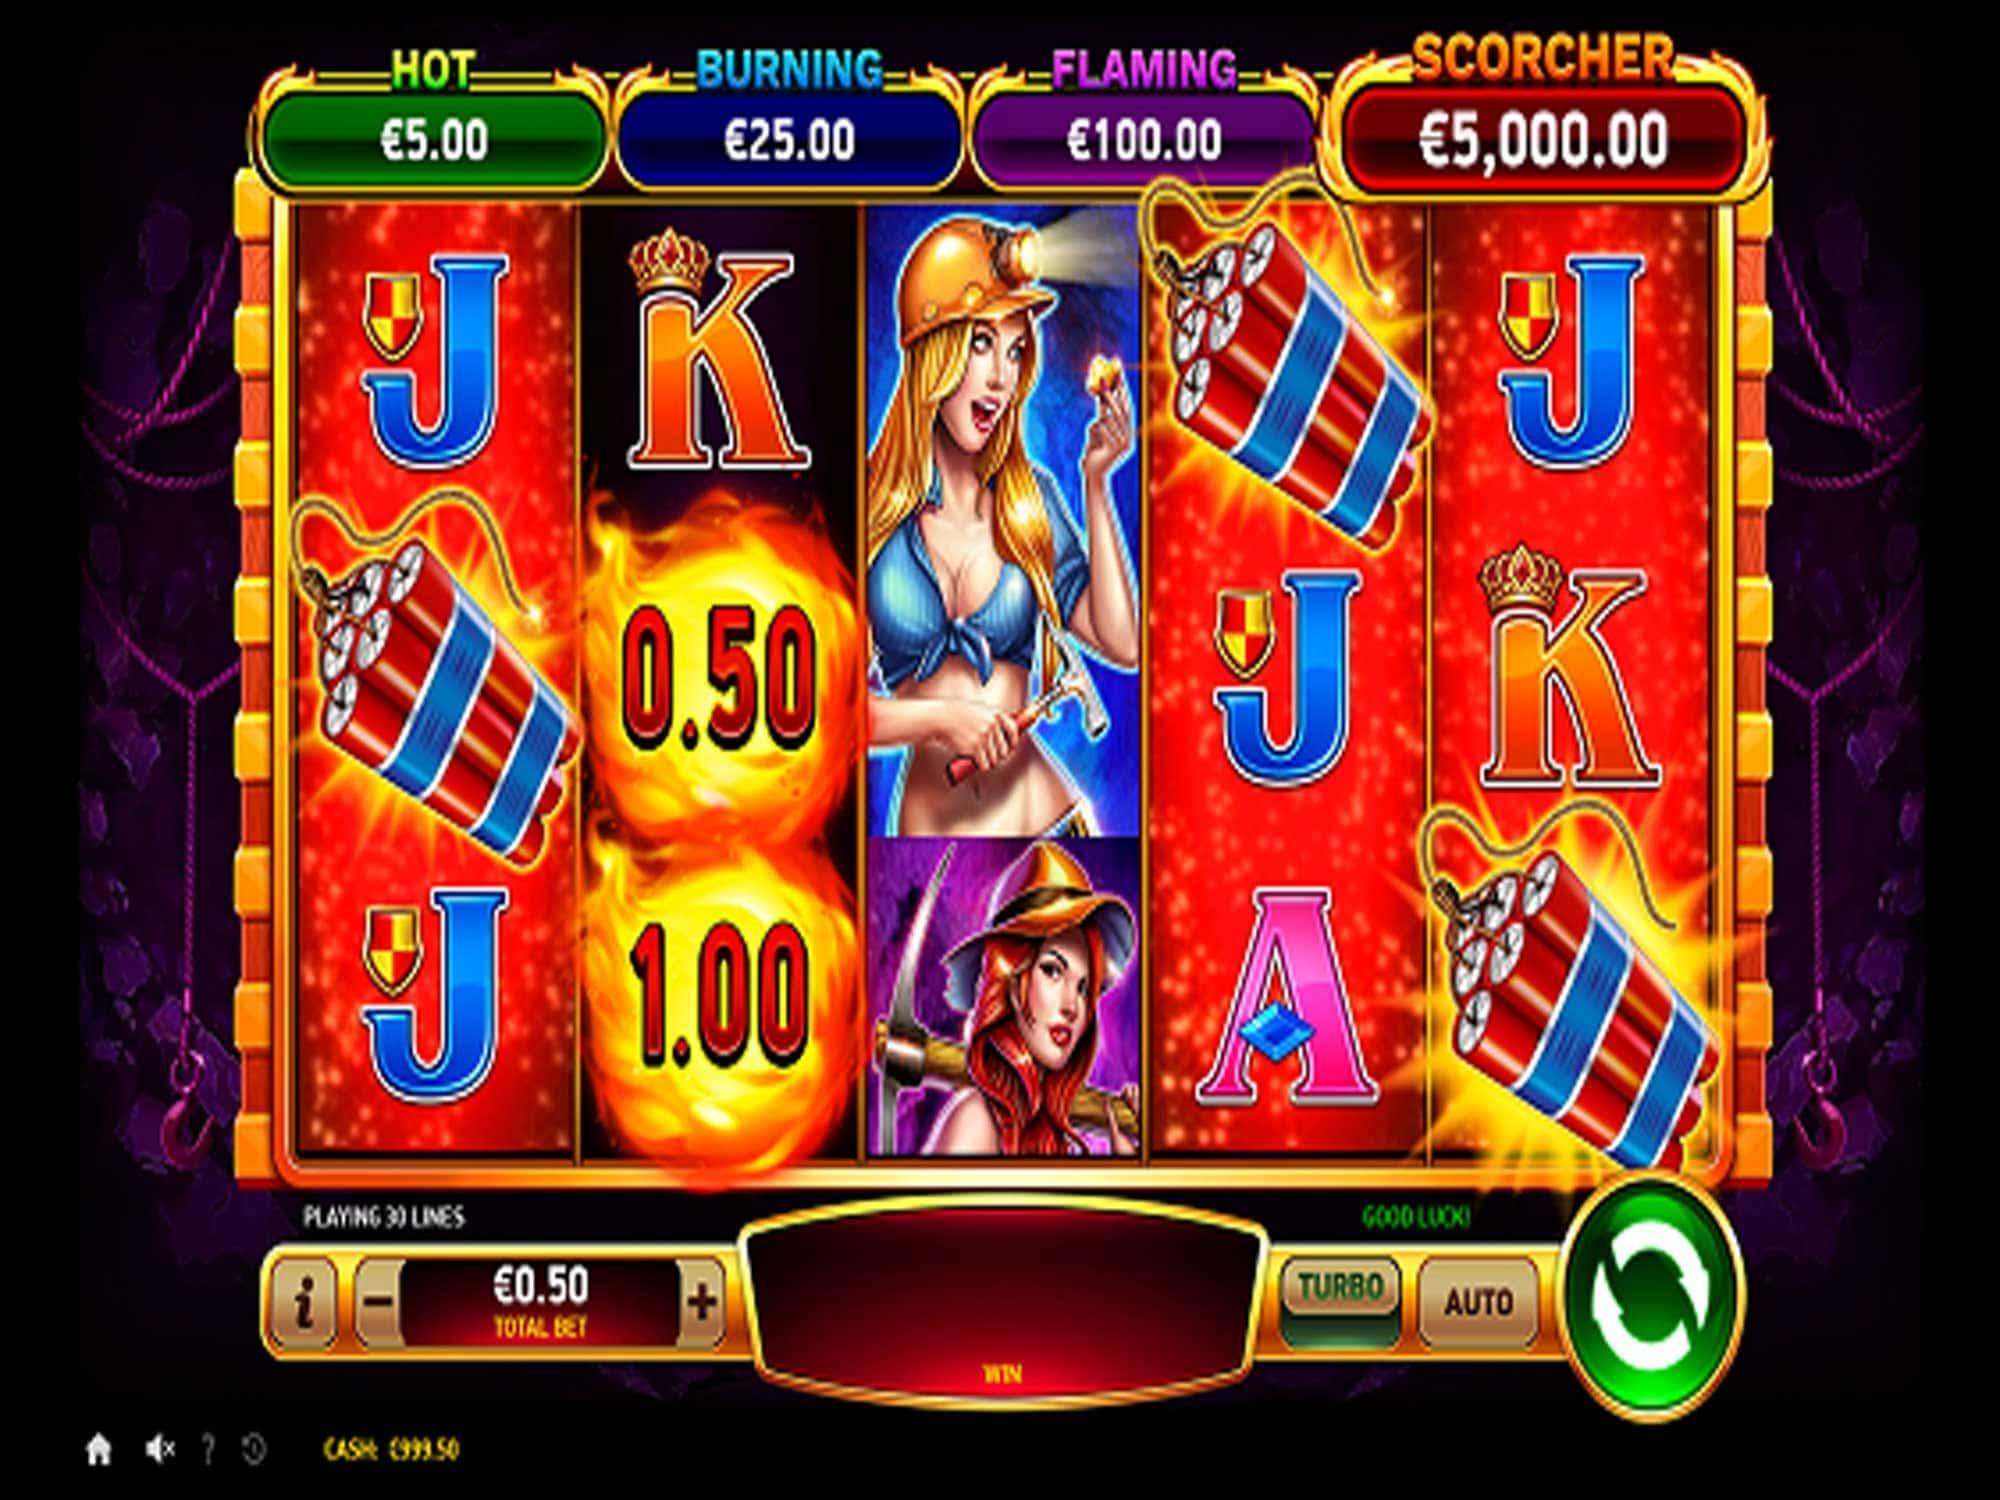 Sizzling Hot Slot Machine Free Play